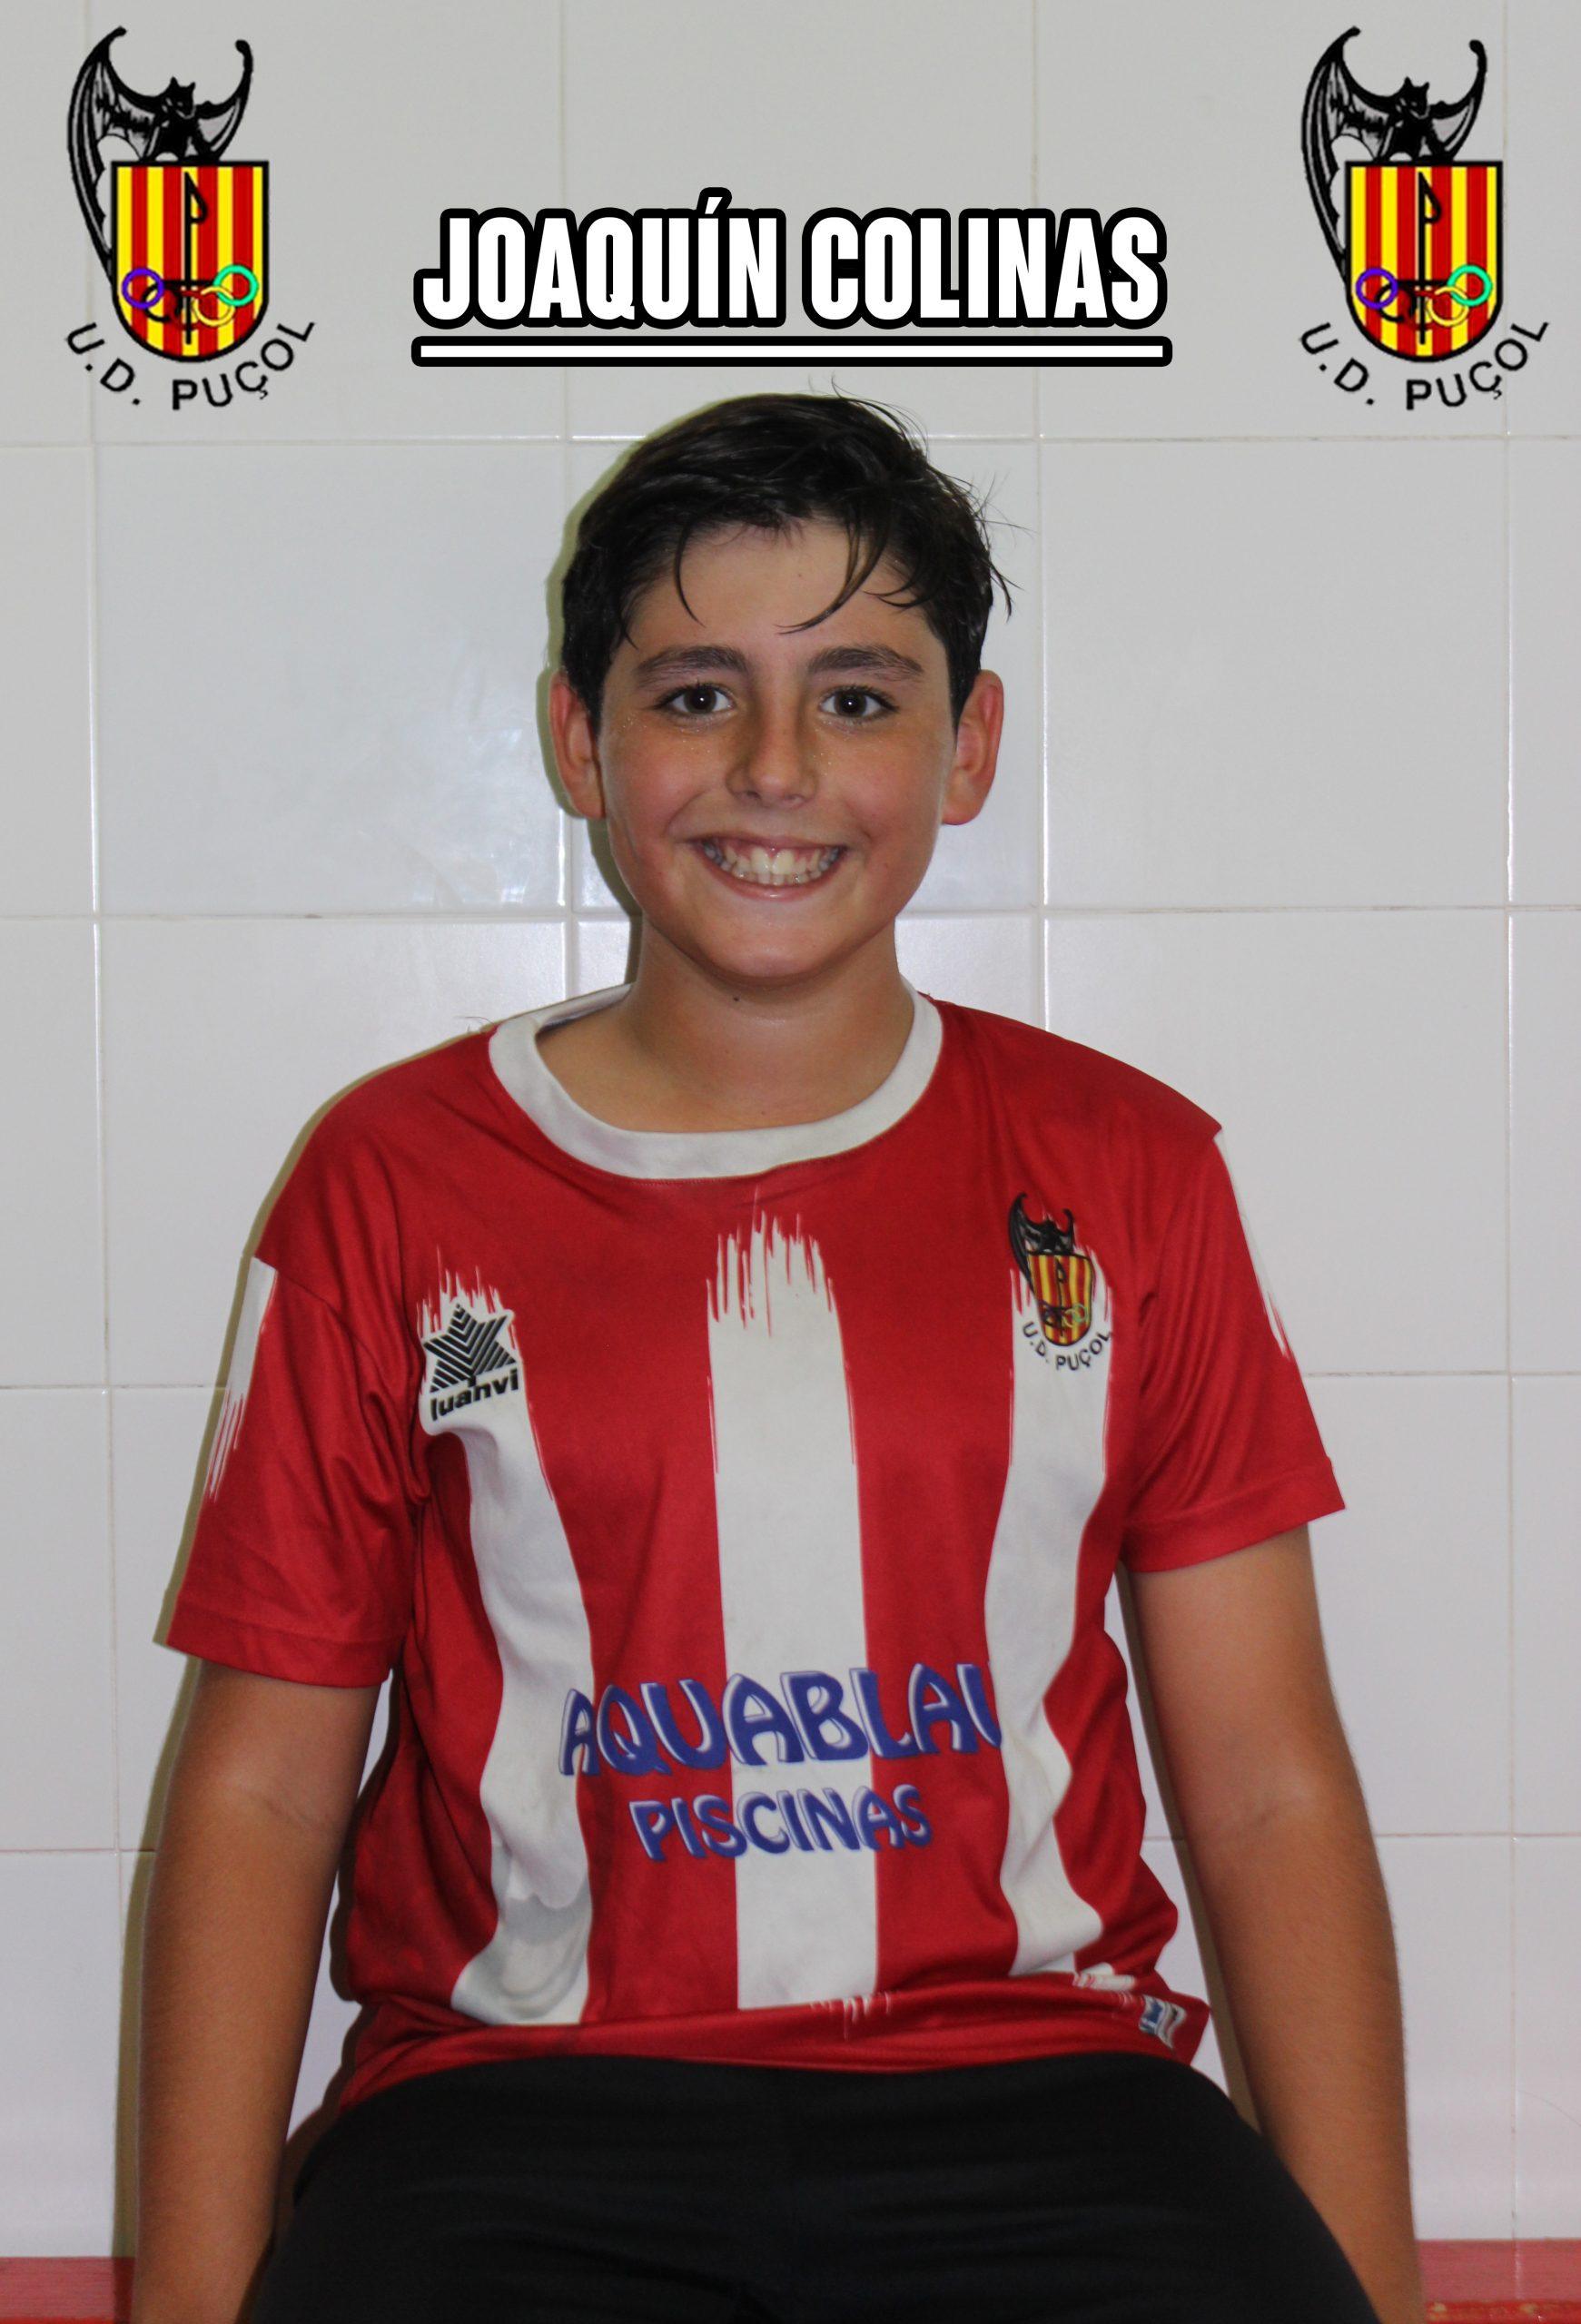 Joaquin Colinas